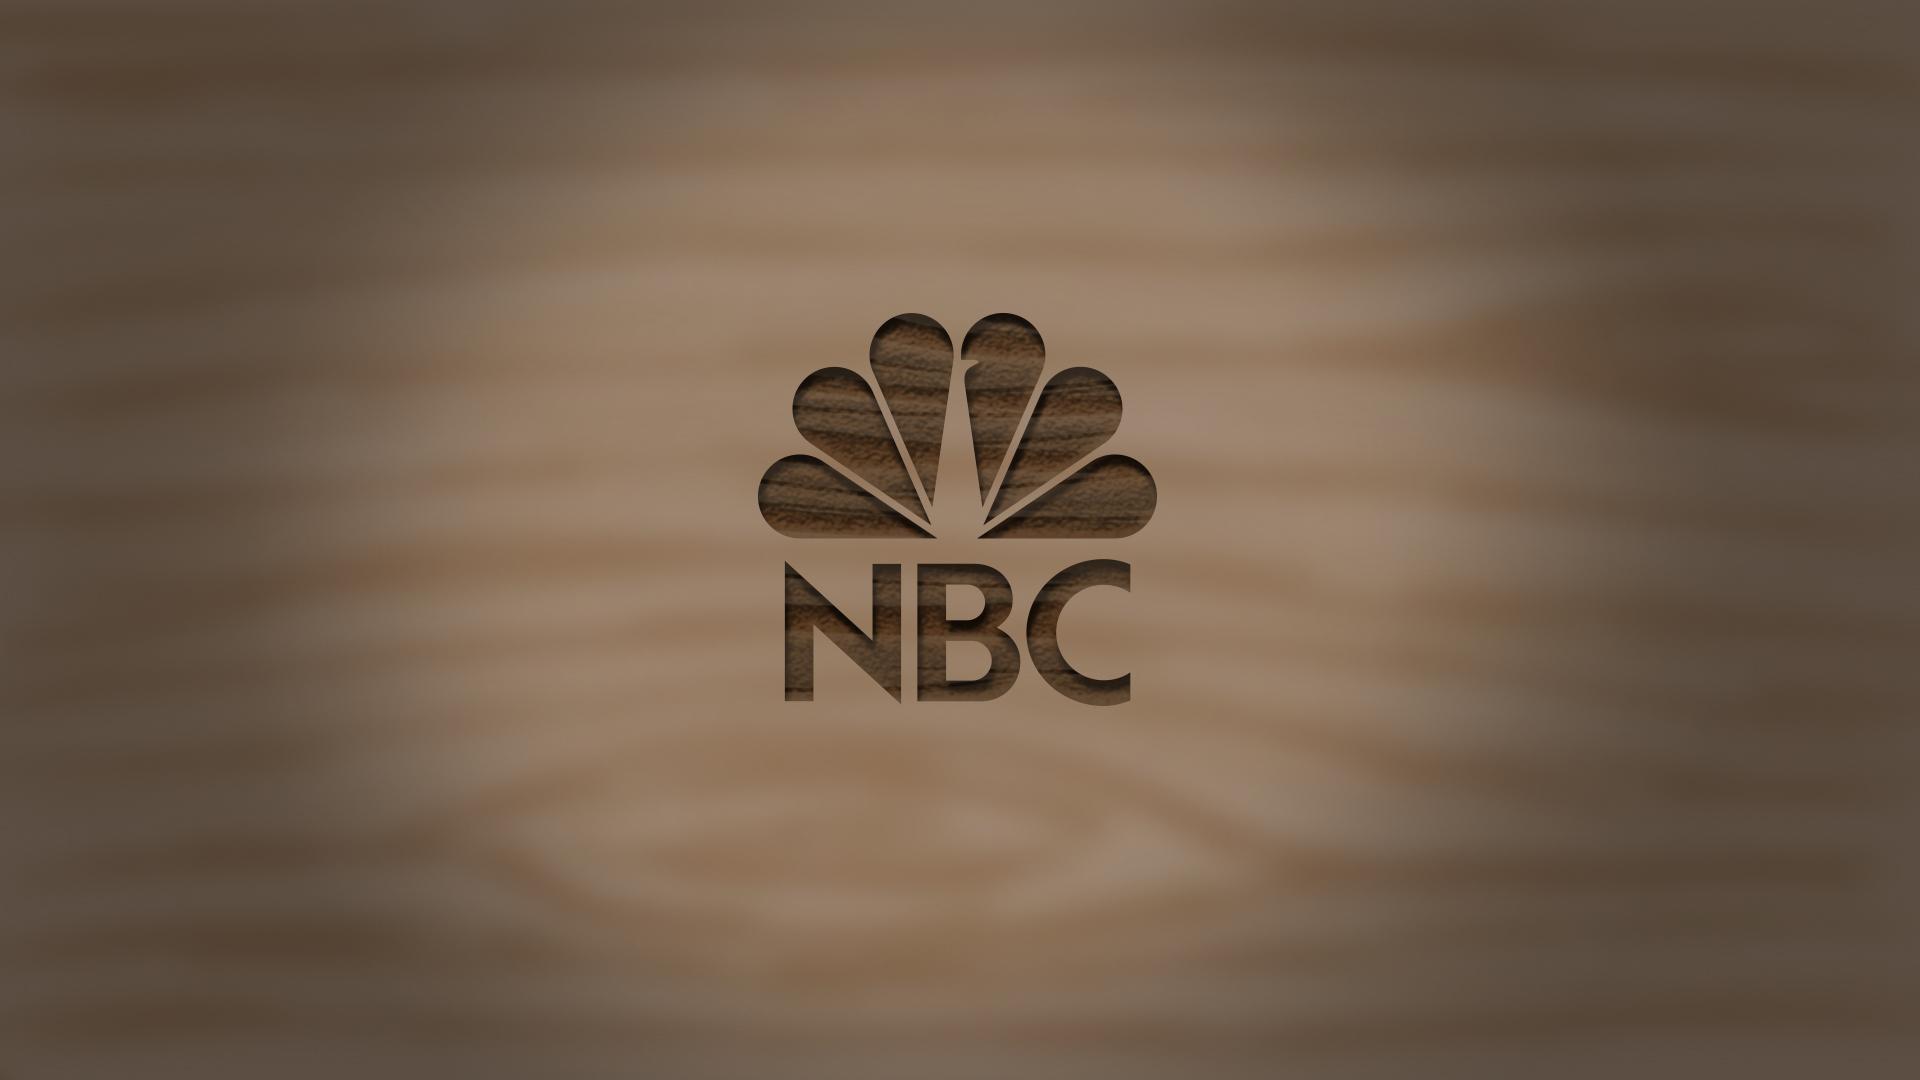 NBCLOGO6.jpg